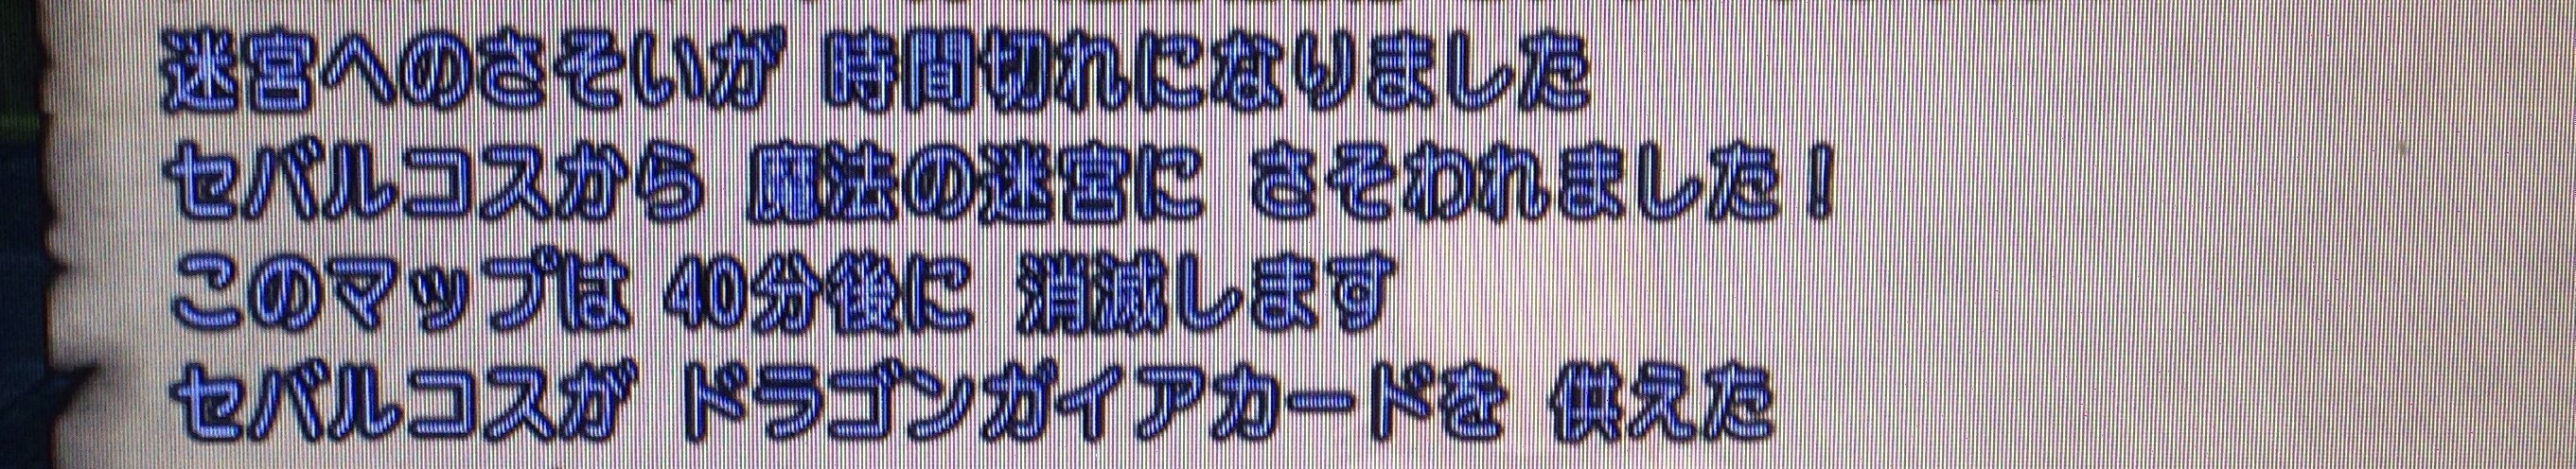 20131019093732a74.jpg